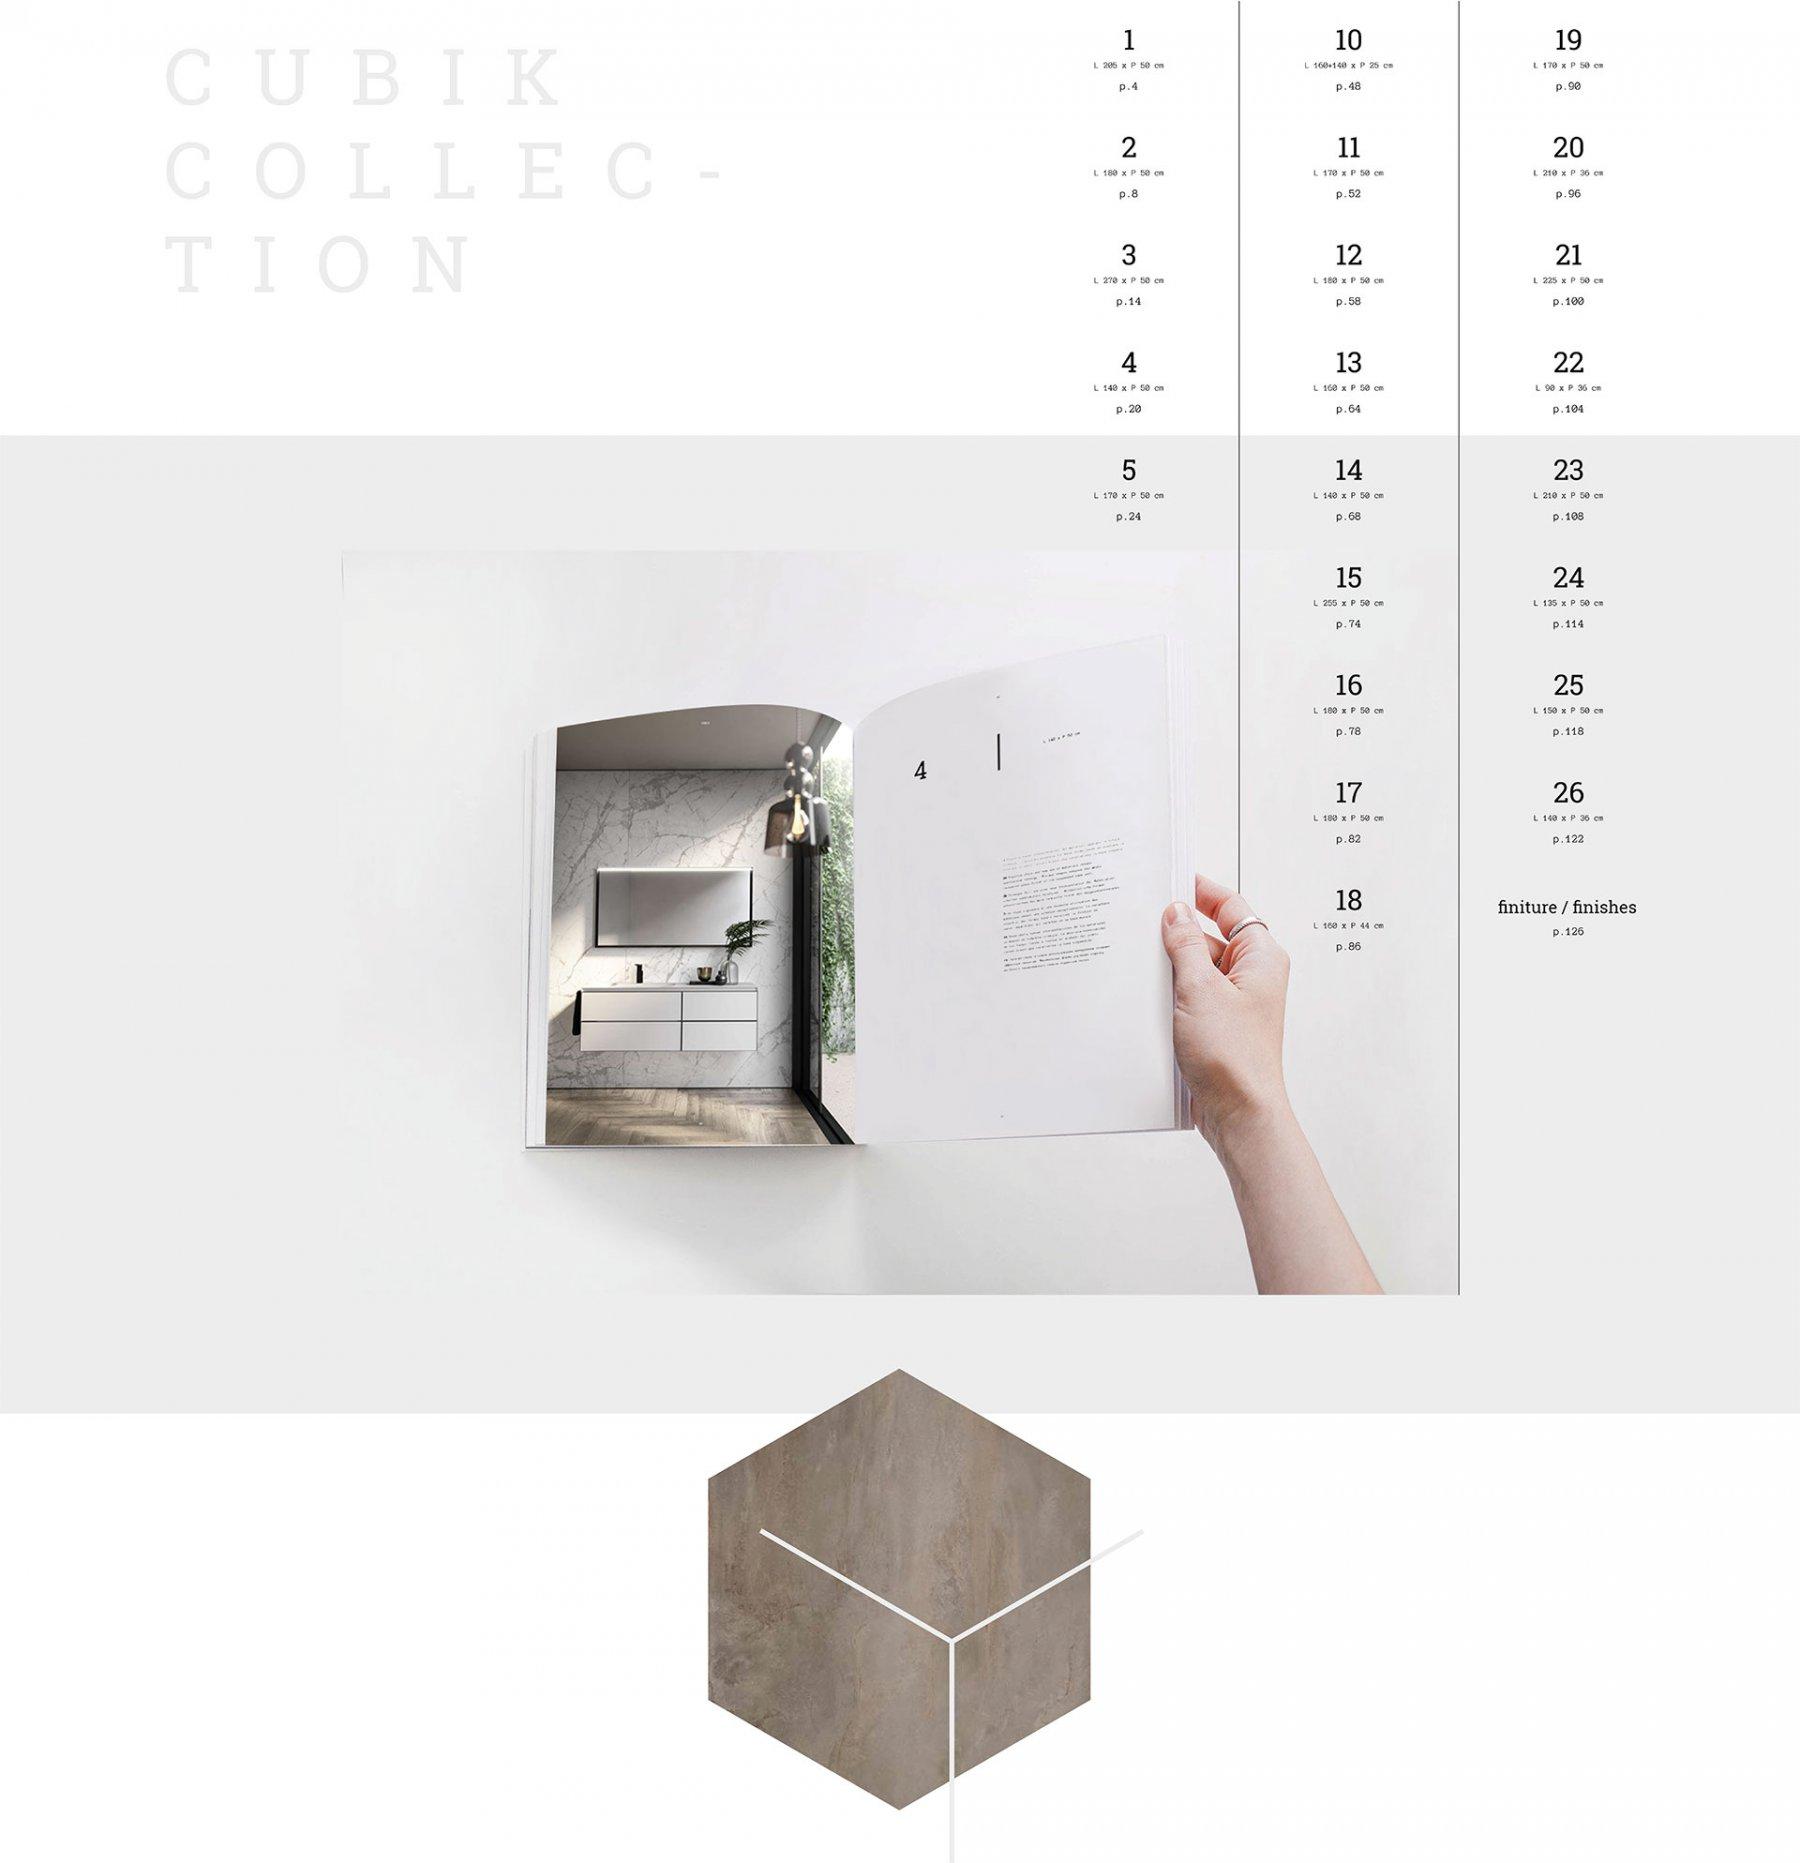 idea-cubik-grafica-catalogo-bagno